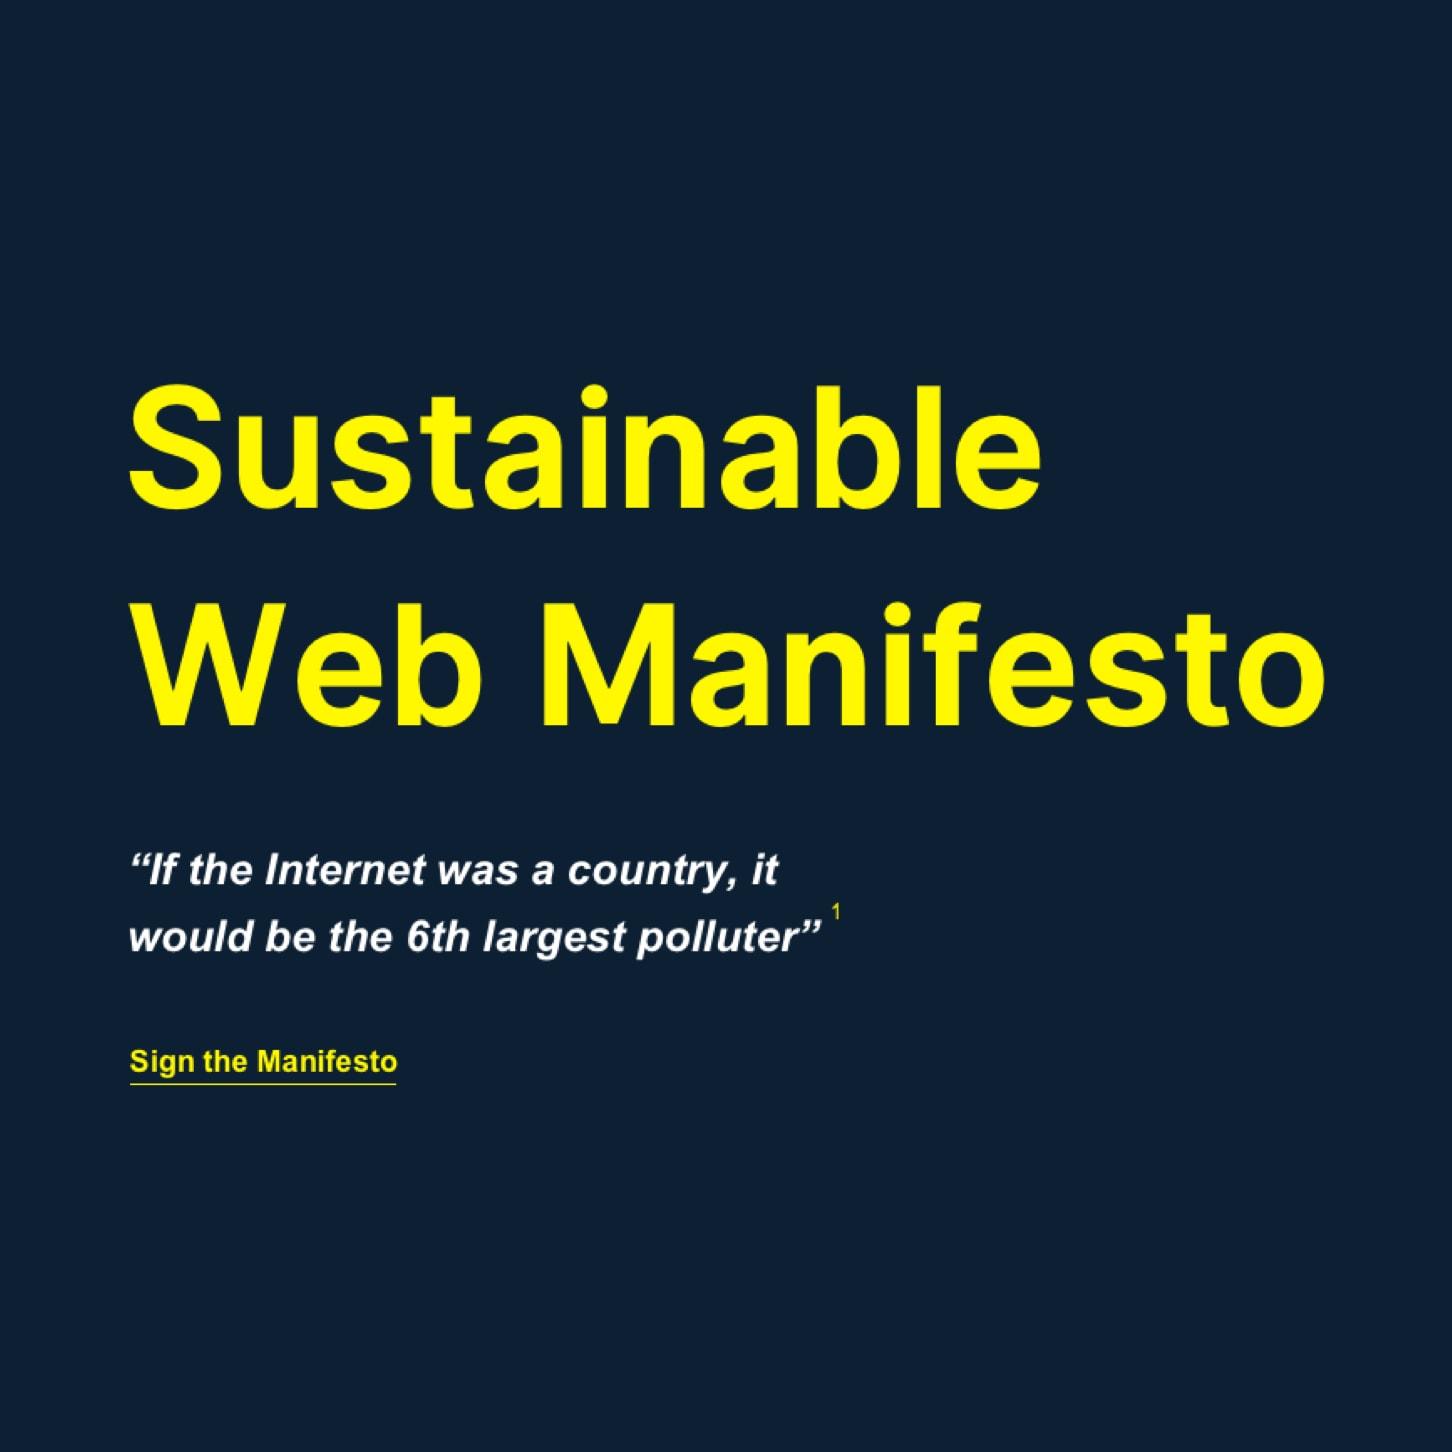 Screenshot of the sustainable web manifesto website